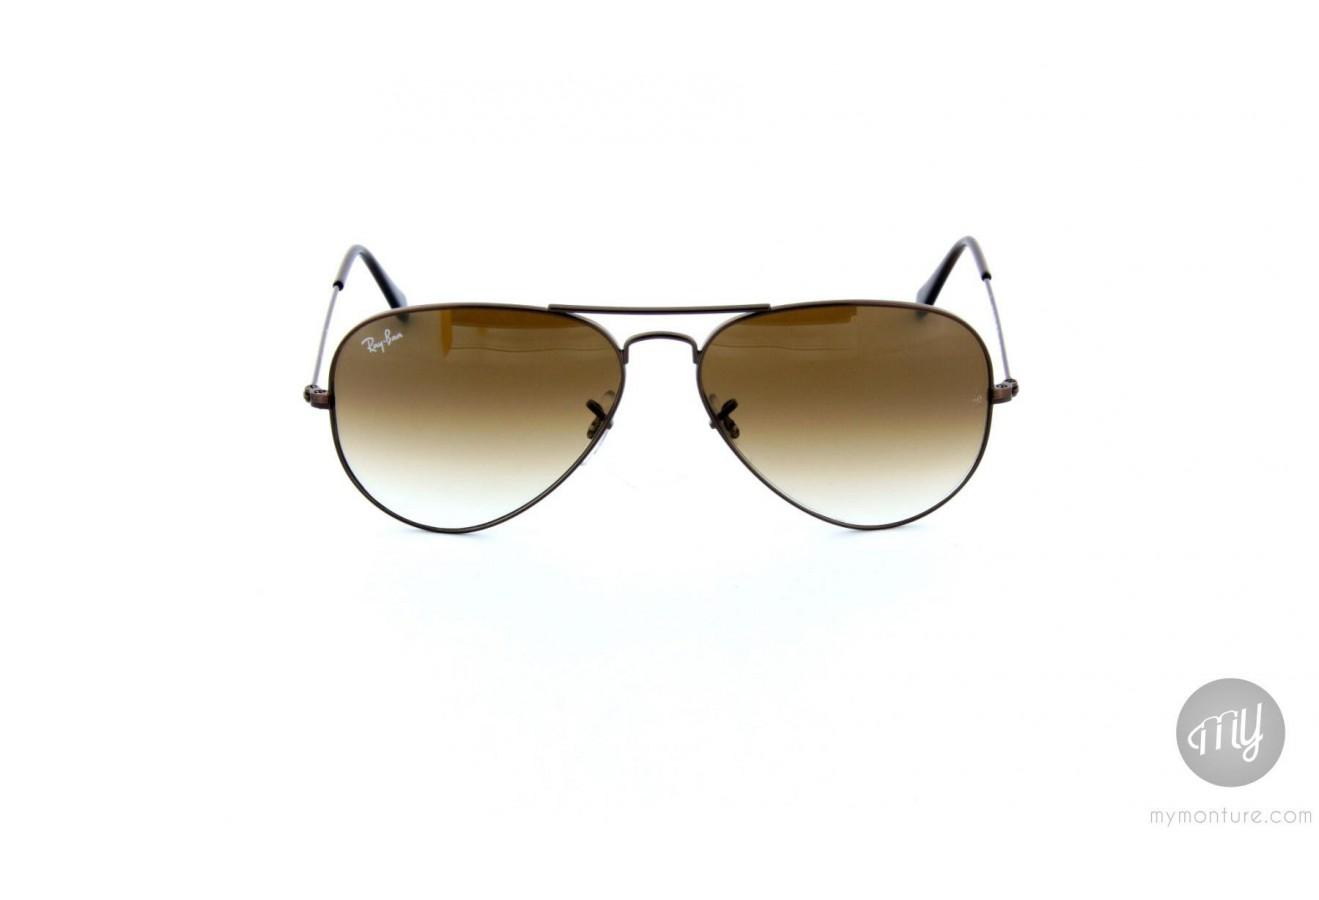 05b61adbce lunette ray ban aviator marron